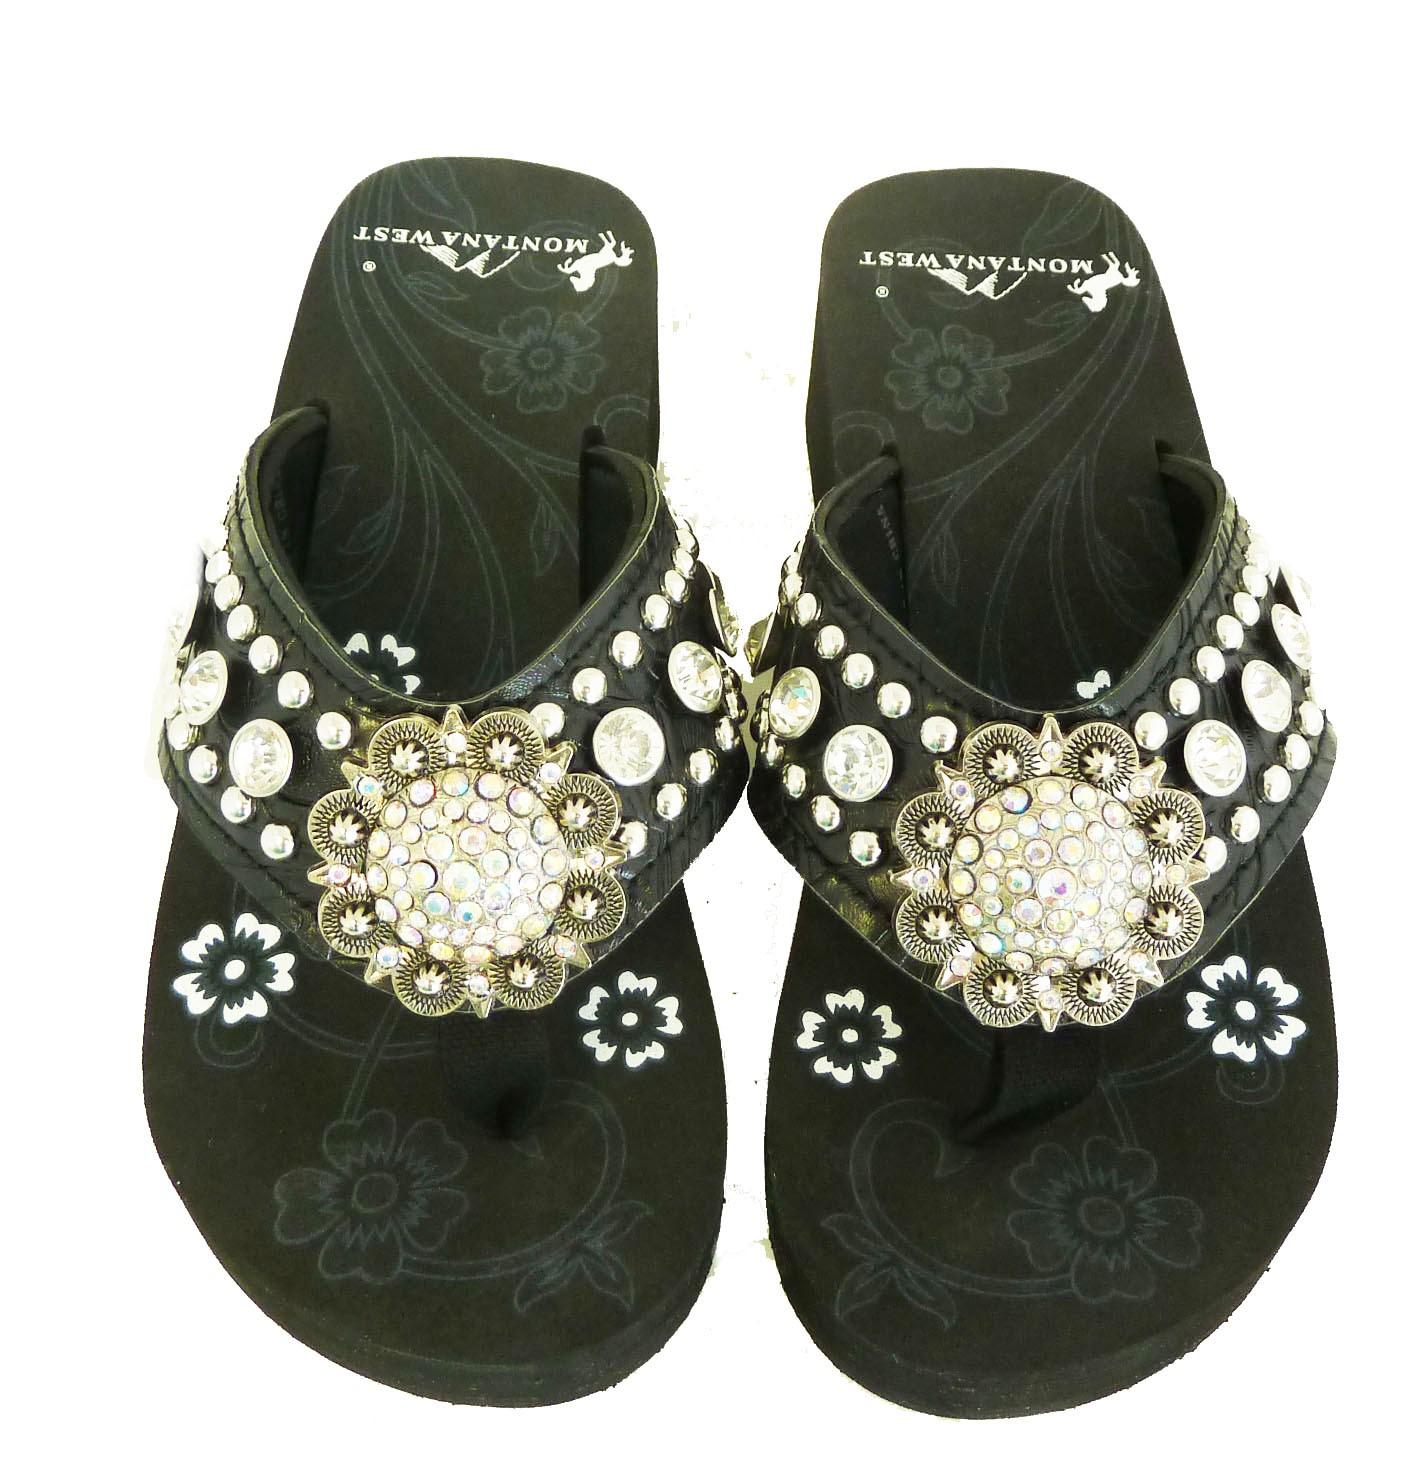 da46e0b6675f Montana West Women Flip Flops Wedged Bling Sandals Large Floral Concho  Coffee